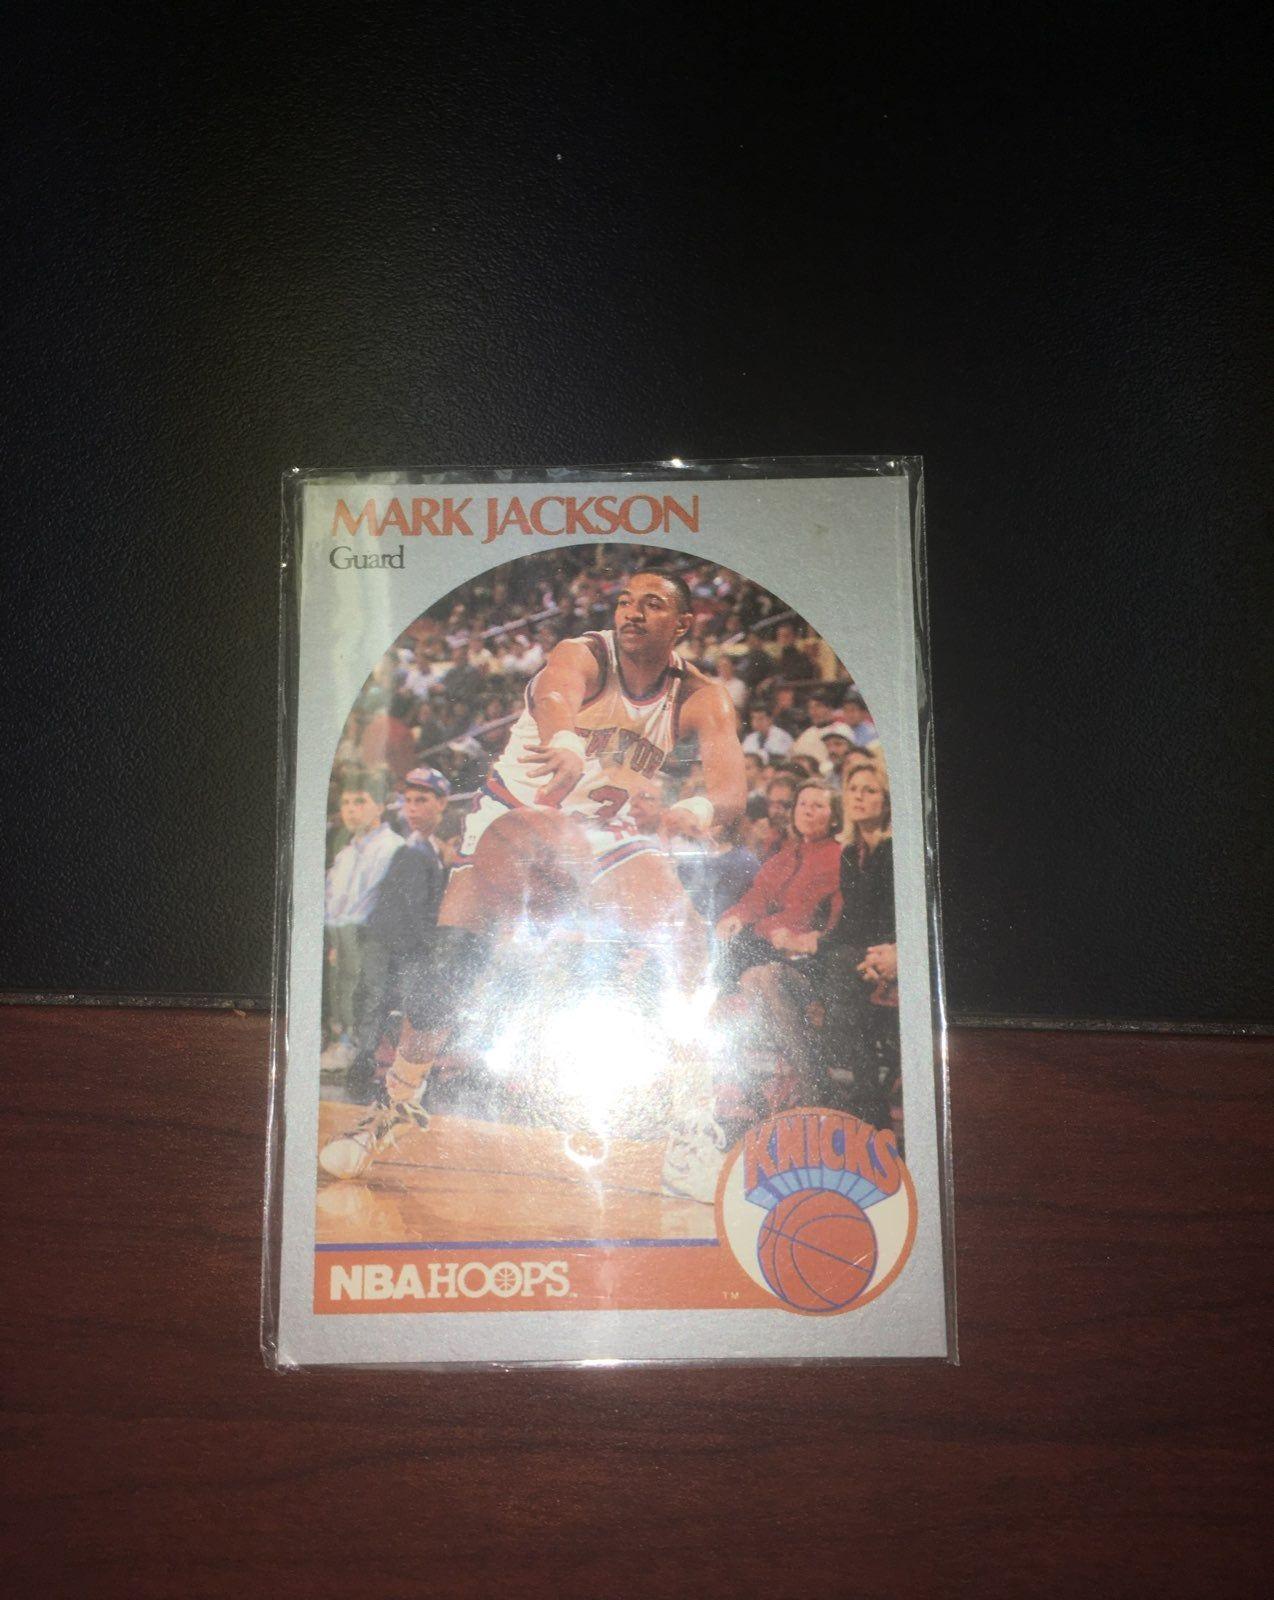 1990 nba hoops mark jackson card featuring the melendez